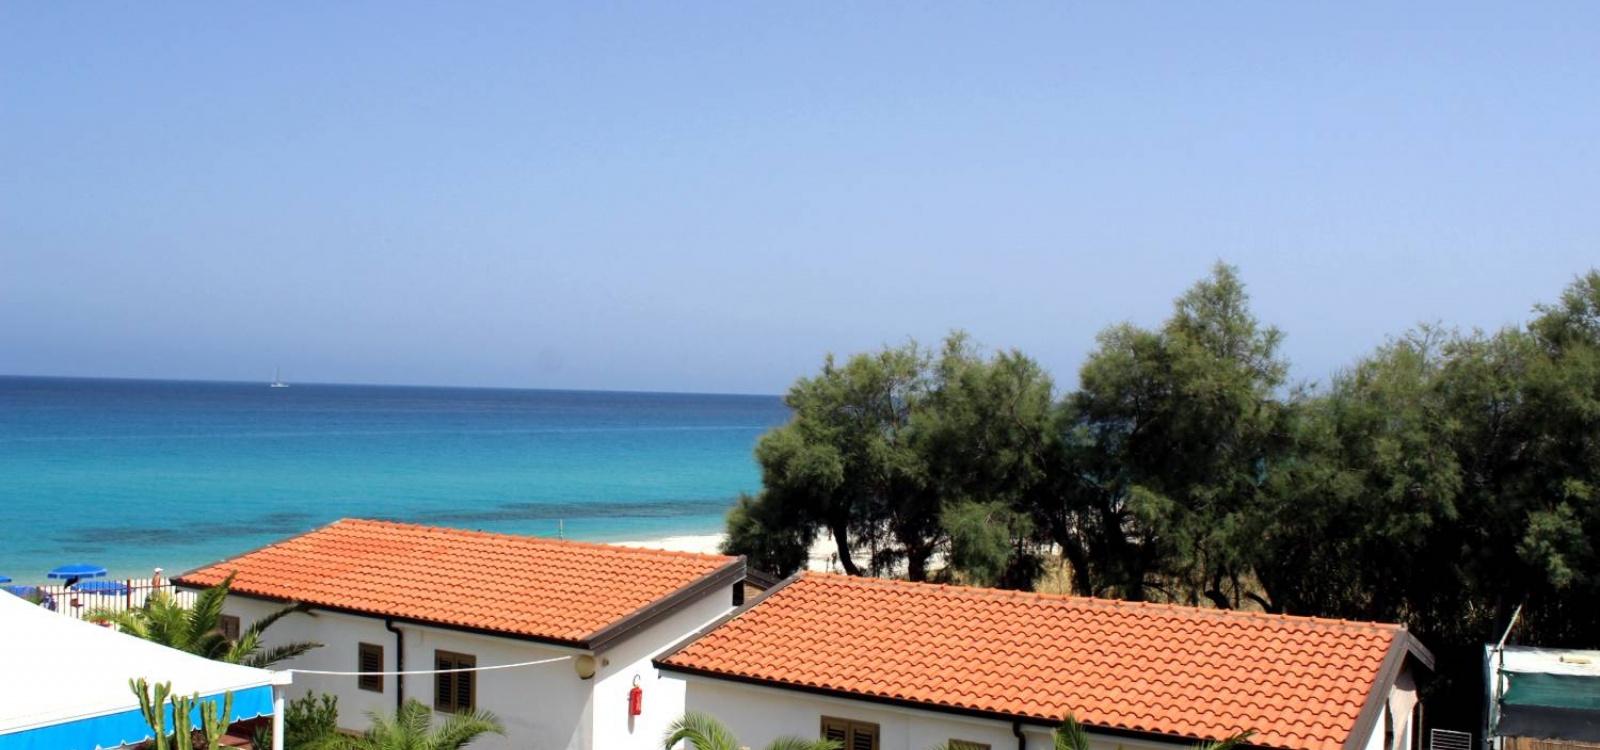 Residence, Affitto per vacanze, ID Struttura 1053, Zambrone Marina, zambrone marina, vibo valentia, Italy,